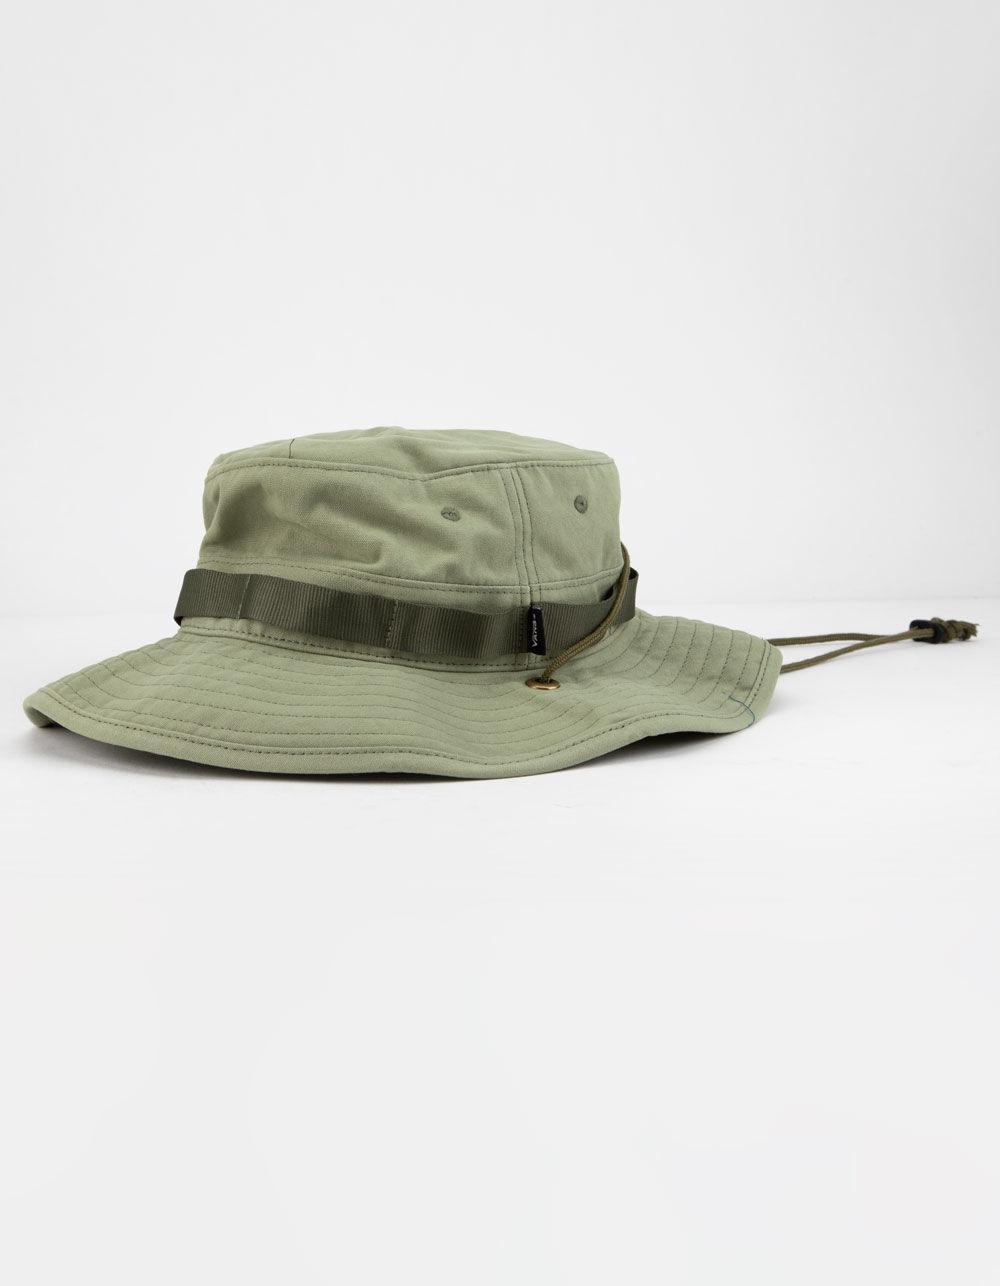 edf84670664 Lyst - Vans Boonie Oil Green Mens Bucket Hat in Green for Men